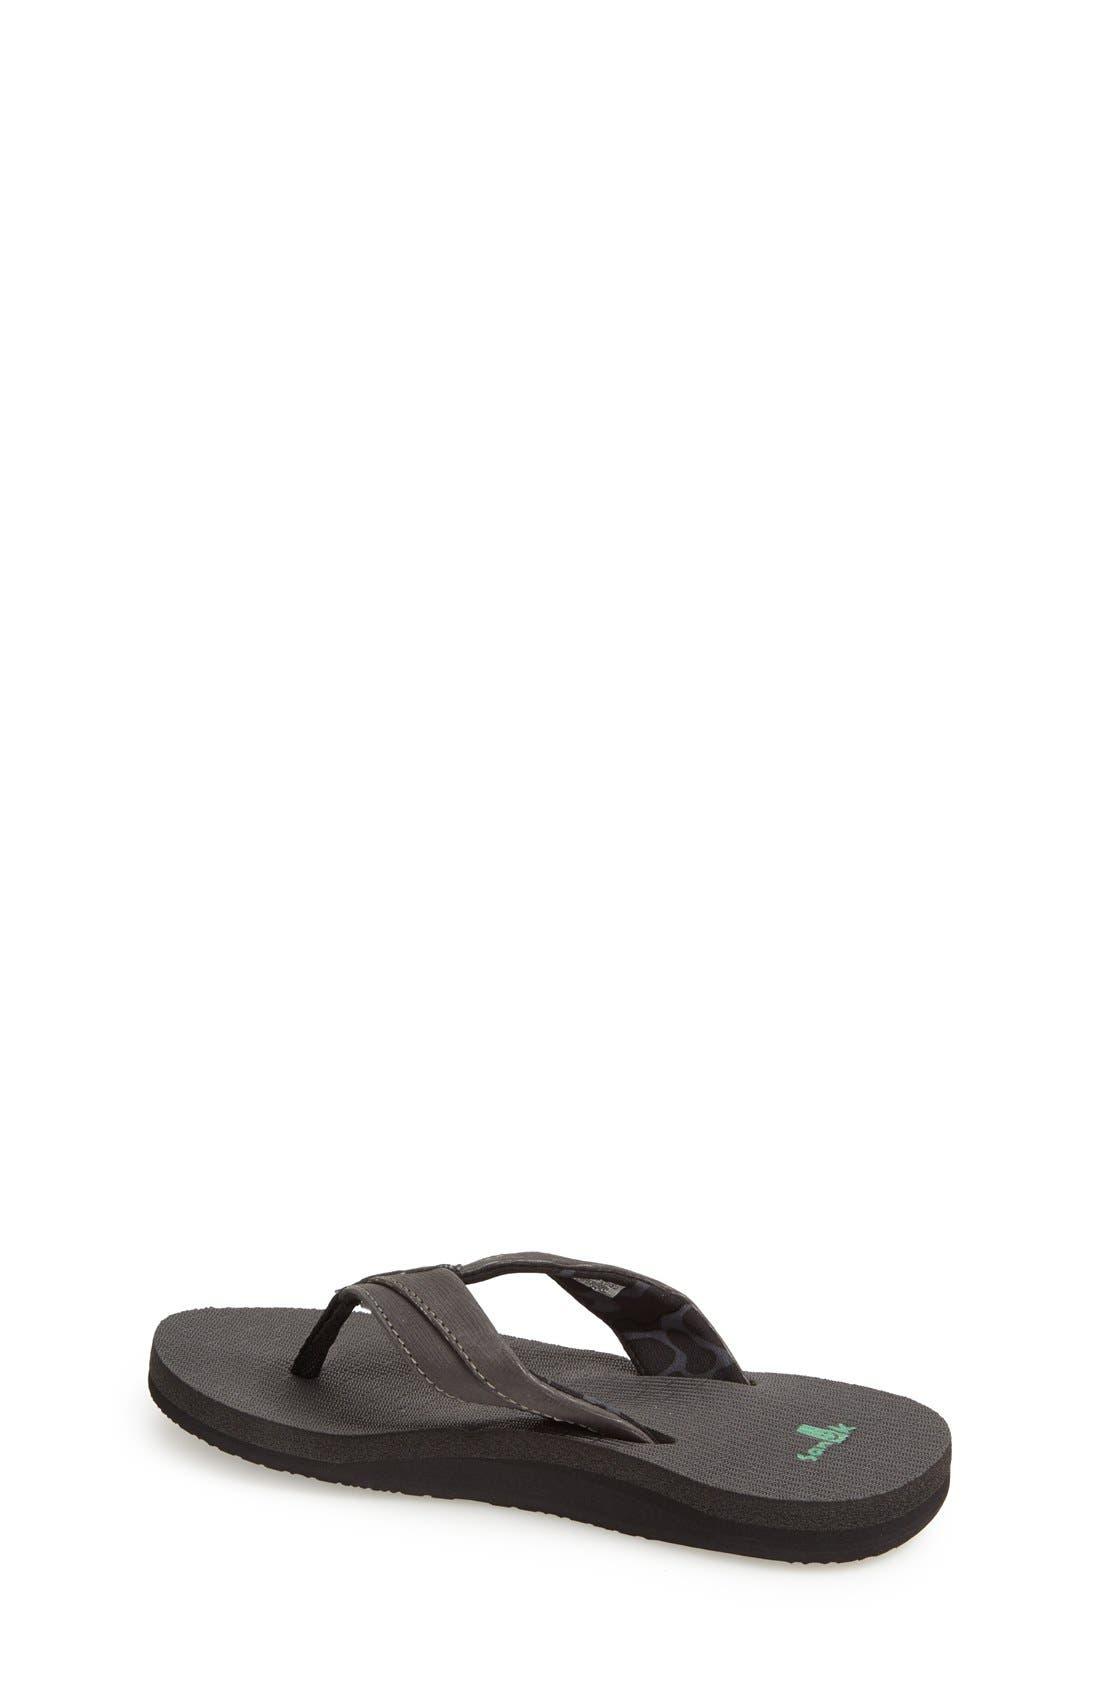 'Rootbeer Cozy' Lightweight Flip Flop Sandal,                             Alternate thumbnail 4, color,                             001